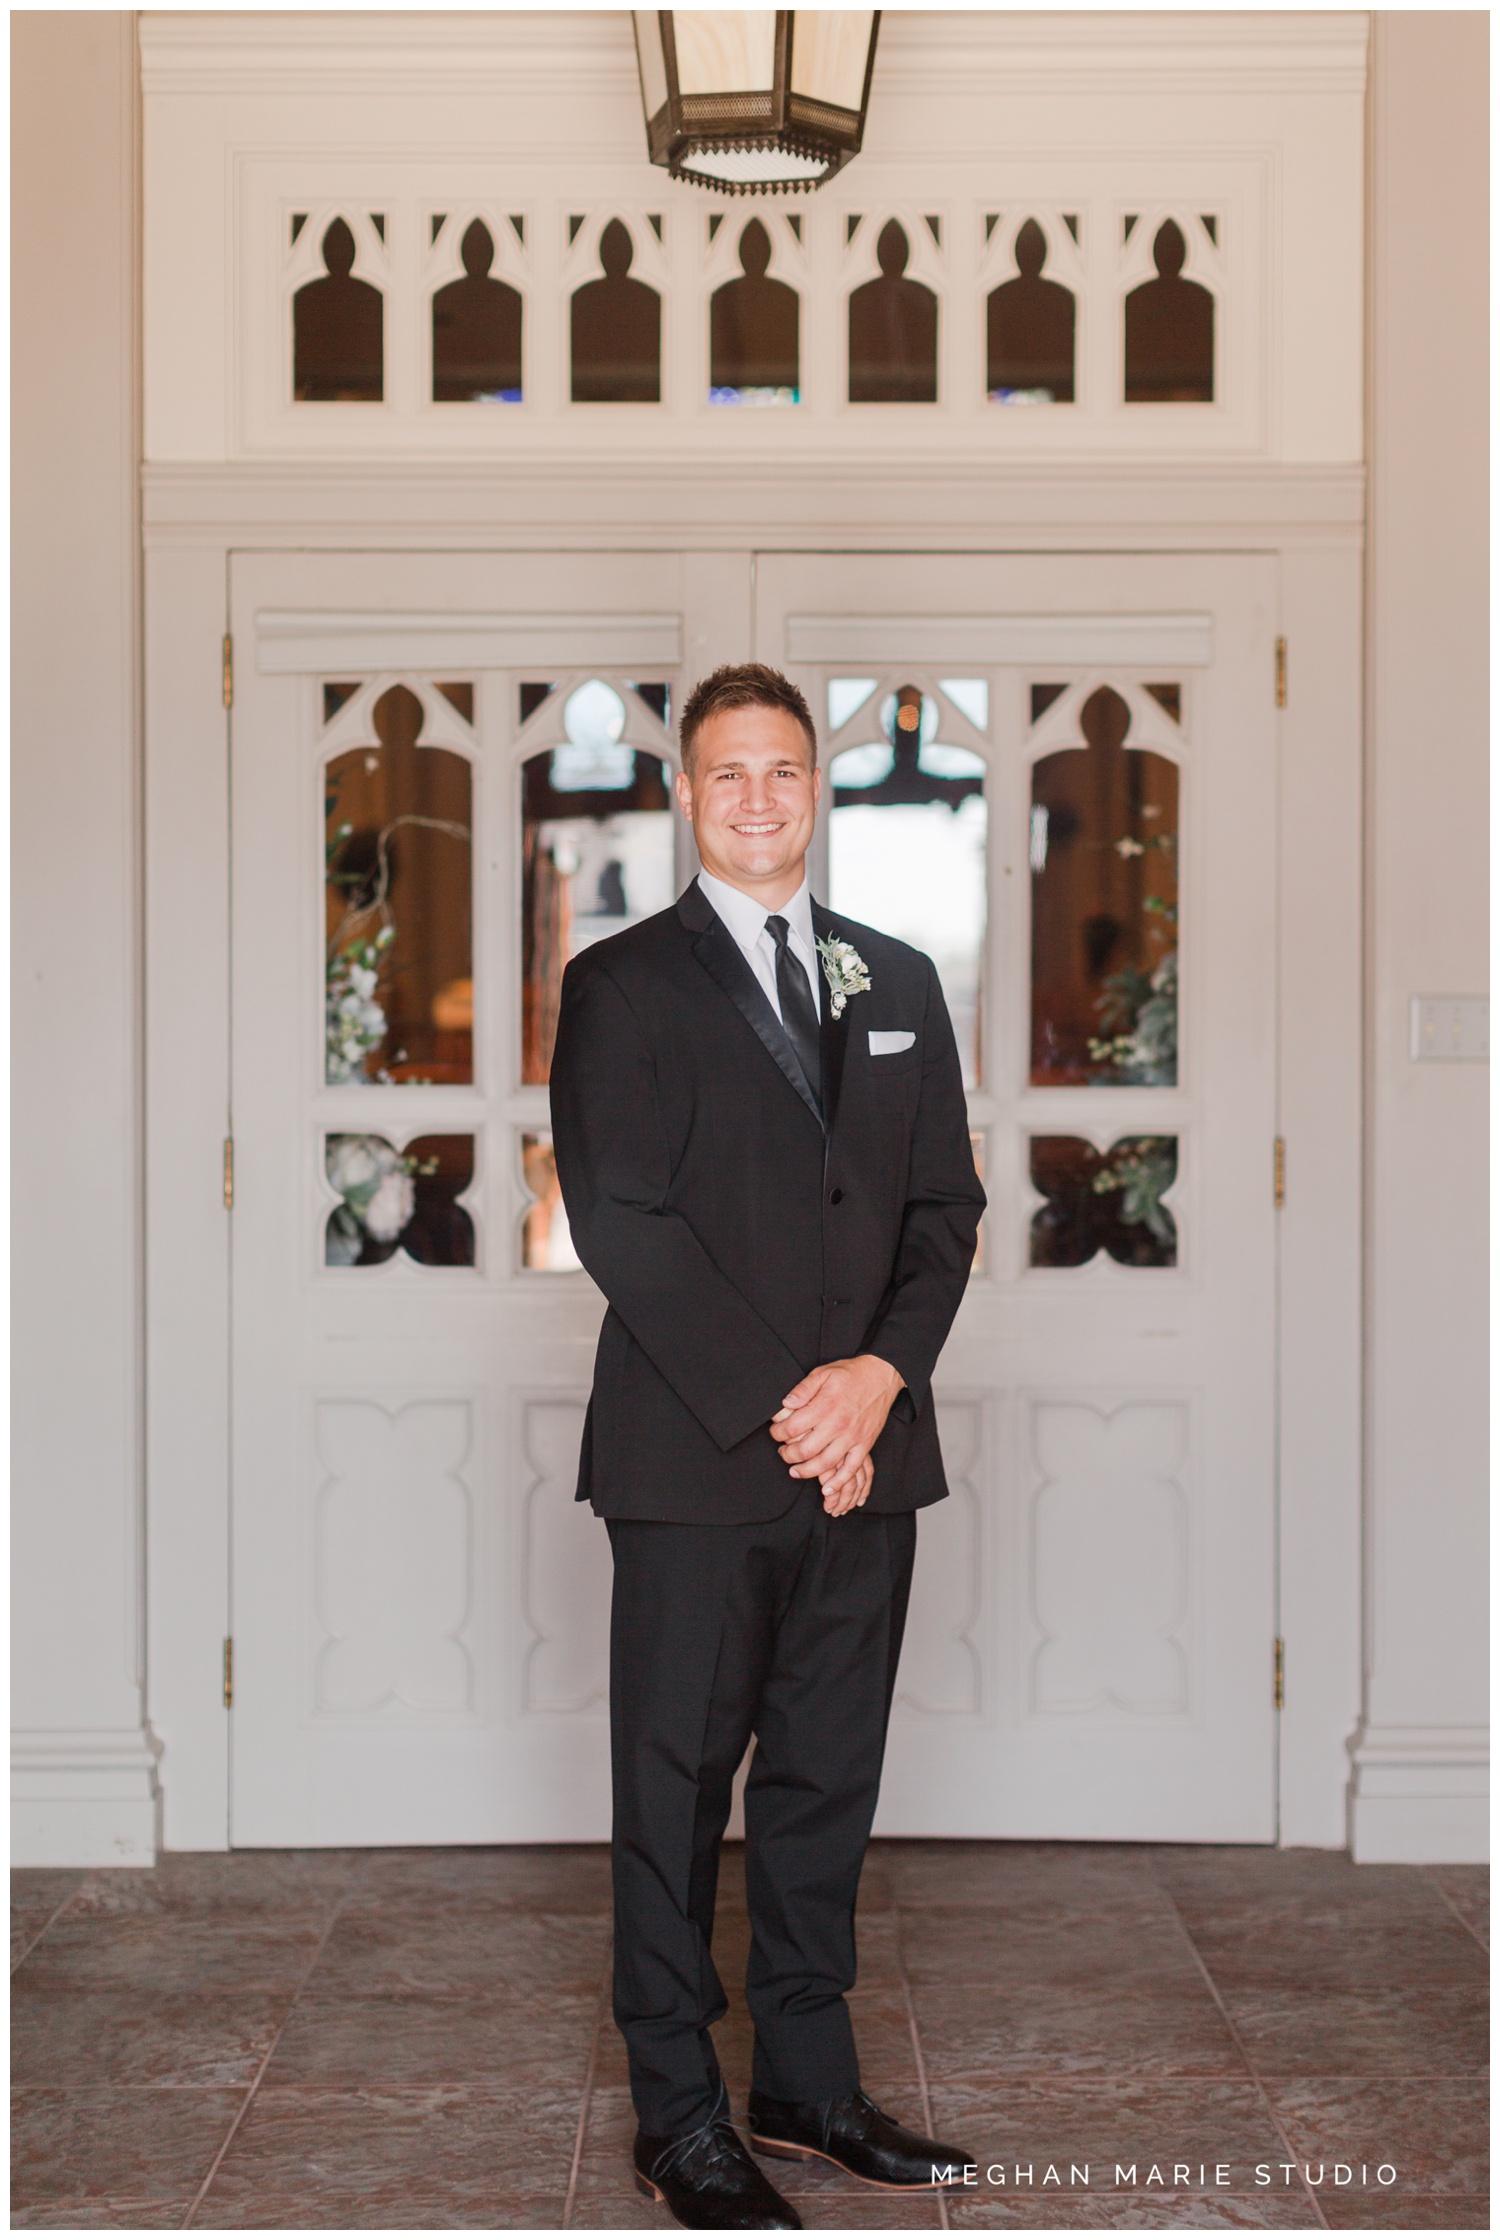 meghan marie studio wedding photographer ohio troy dayton columbus fort loramie st michael hall demange ken midmark elegant black suits metallics hollywood soft glam family wedding_0498.jpg